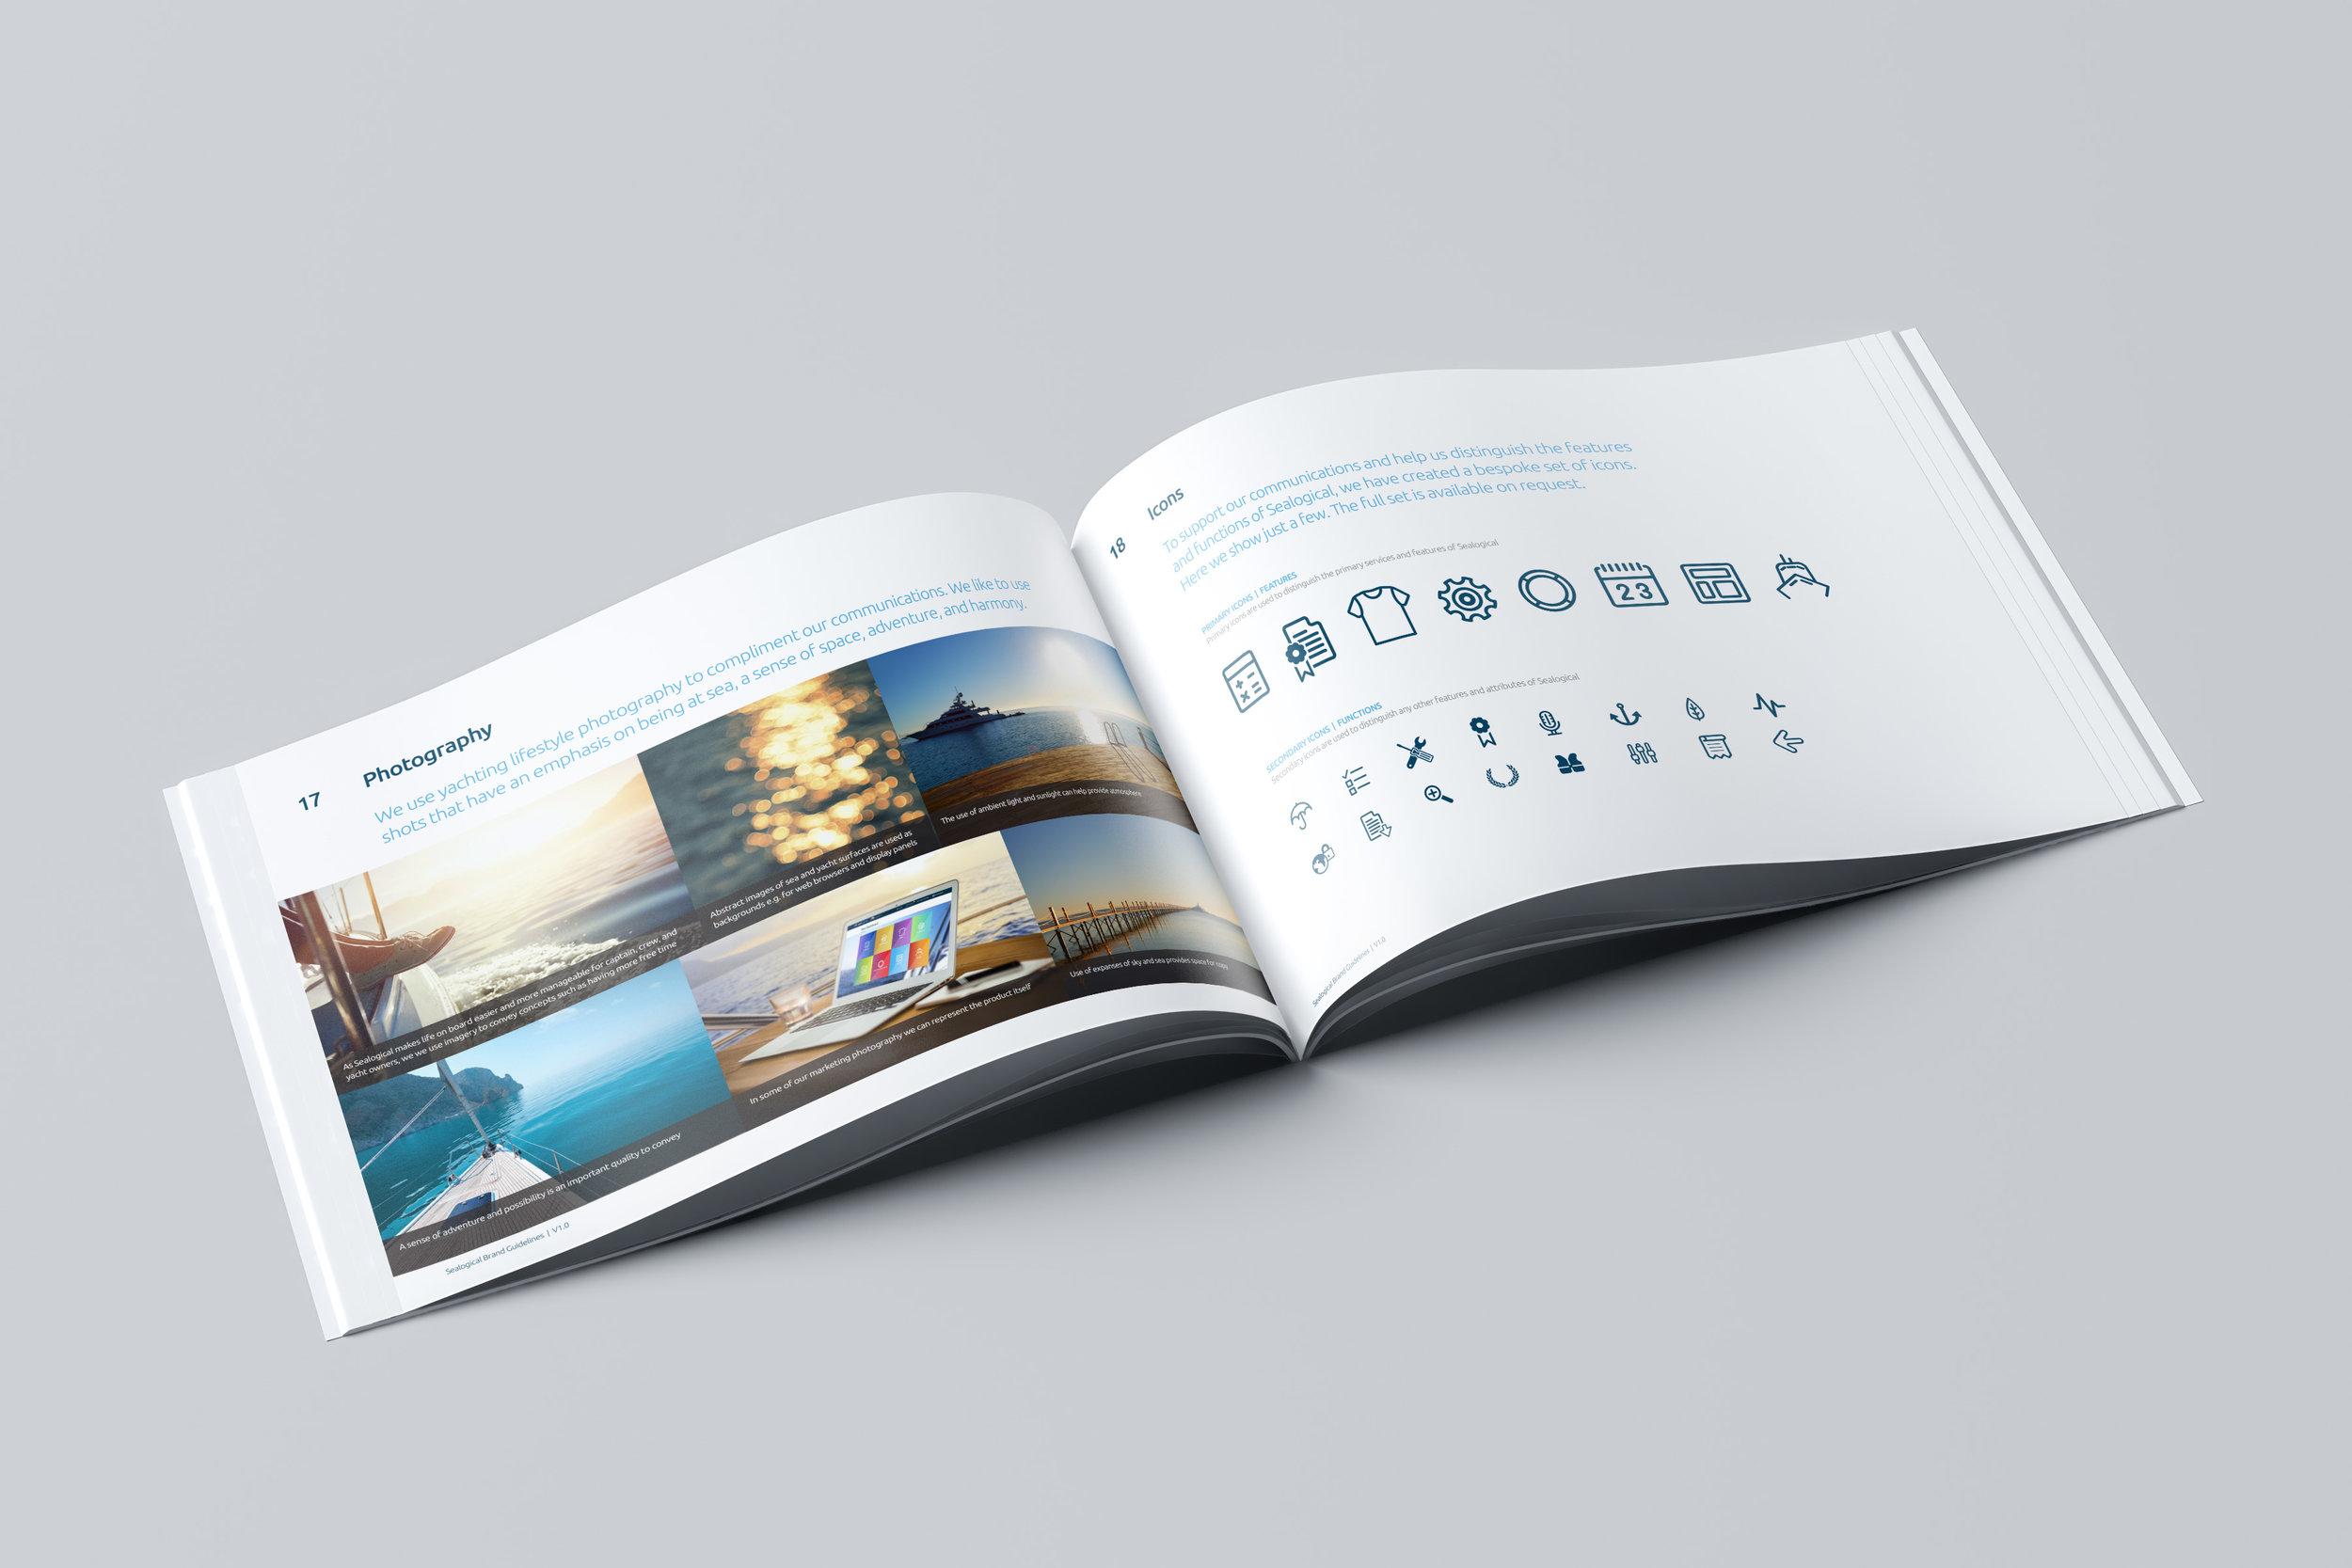 SL-brand-guidelines-spread-pg-3.jpg